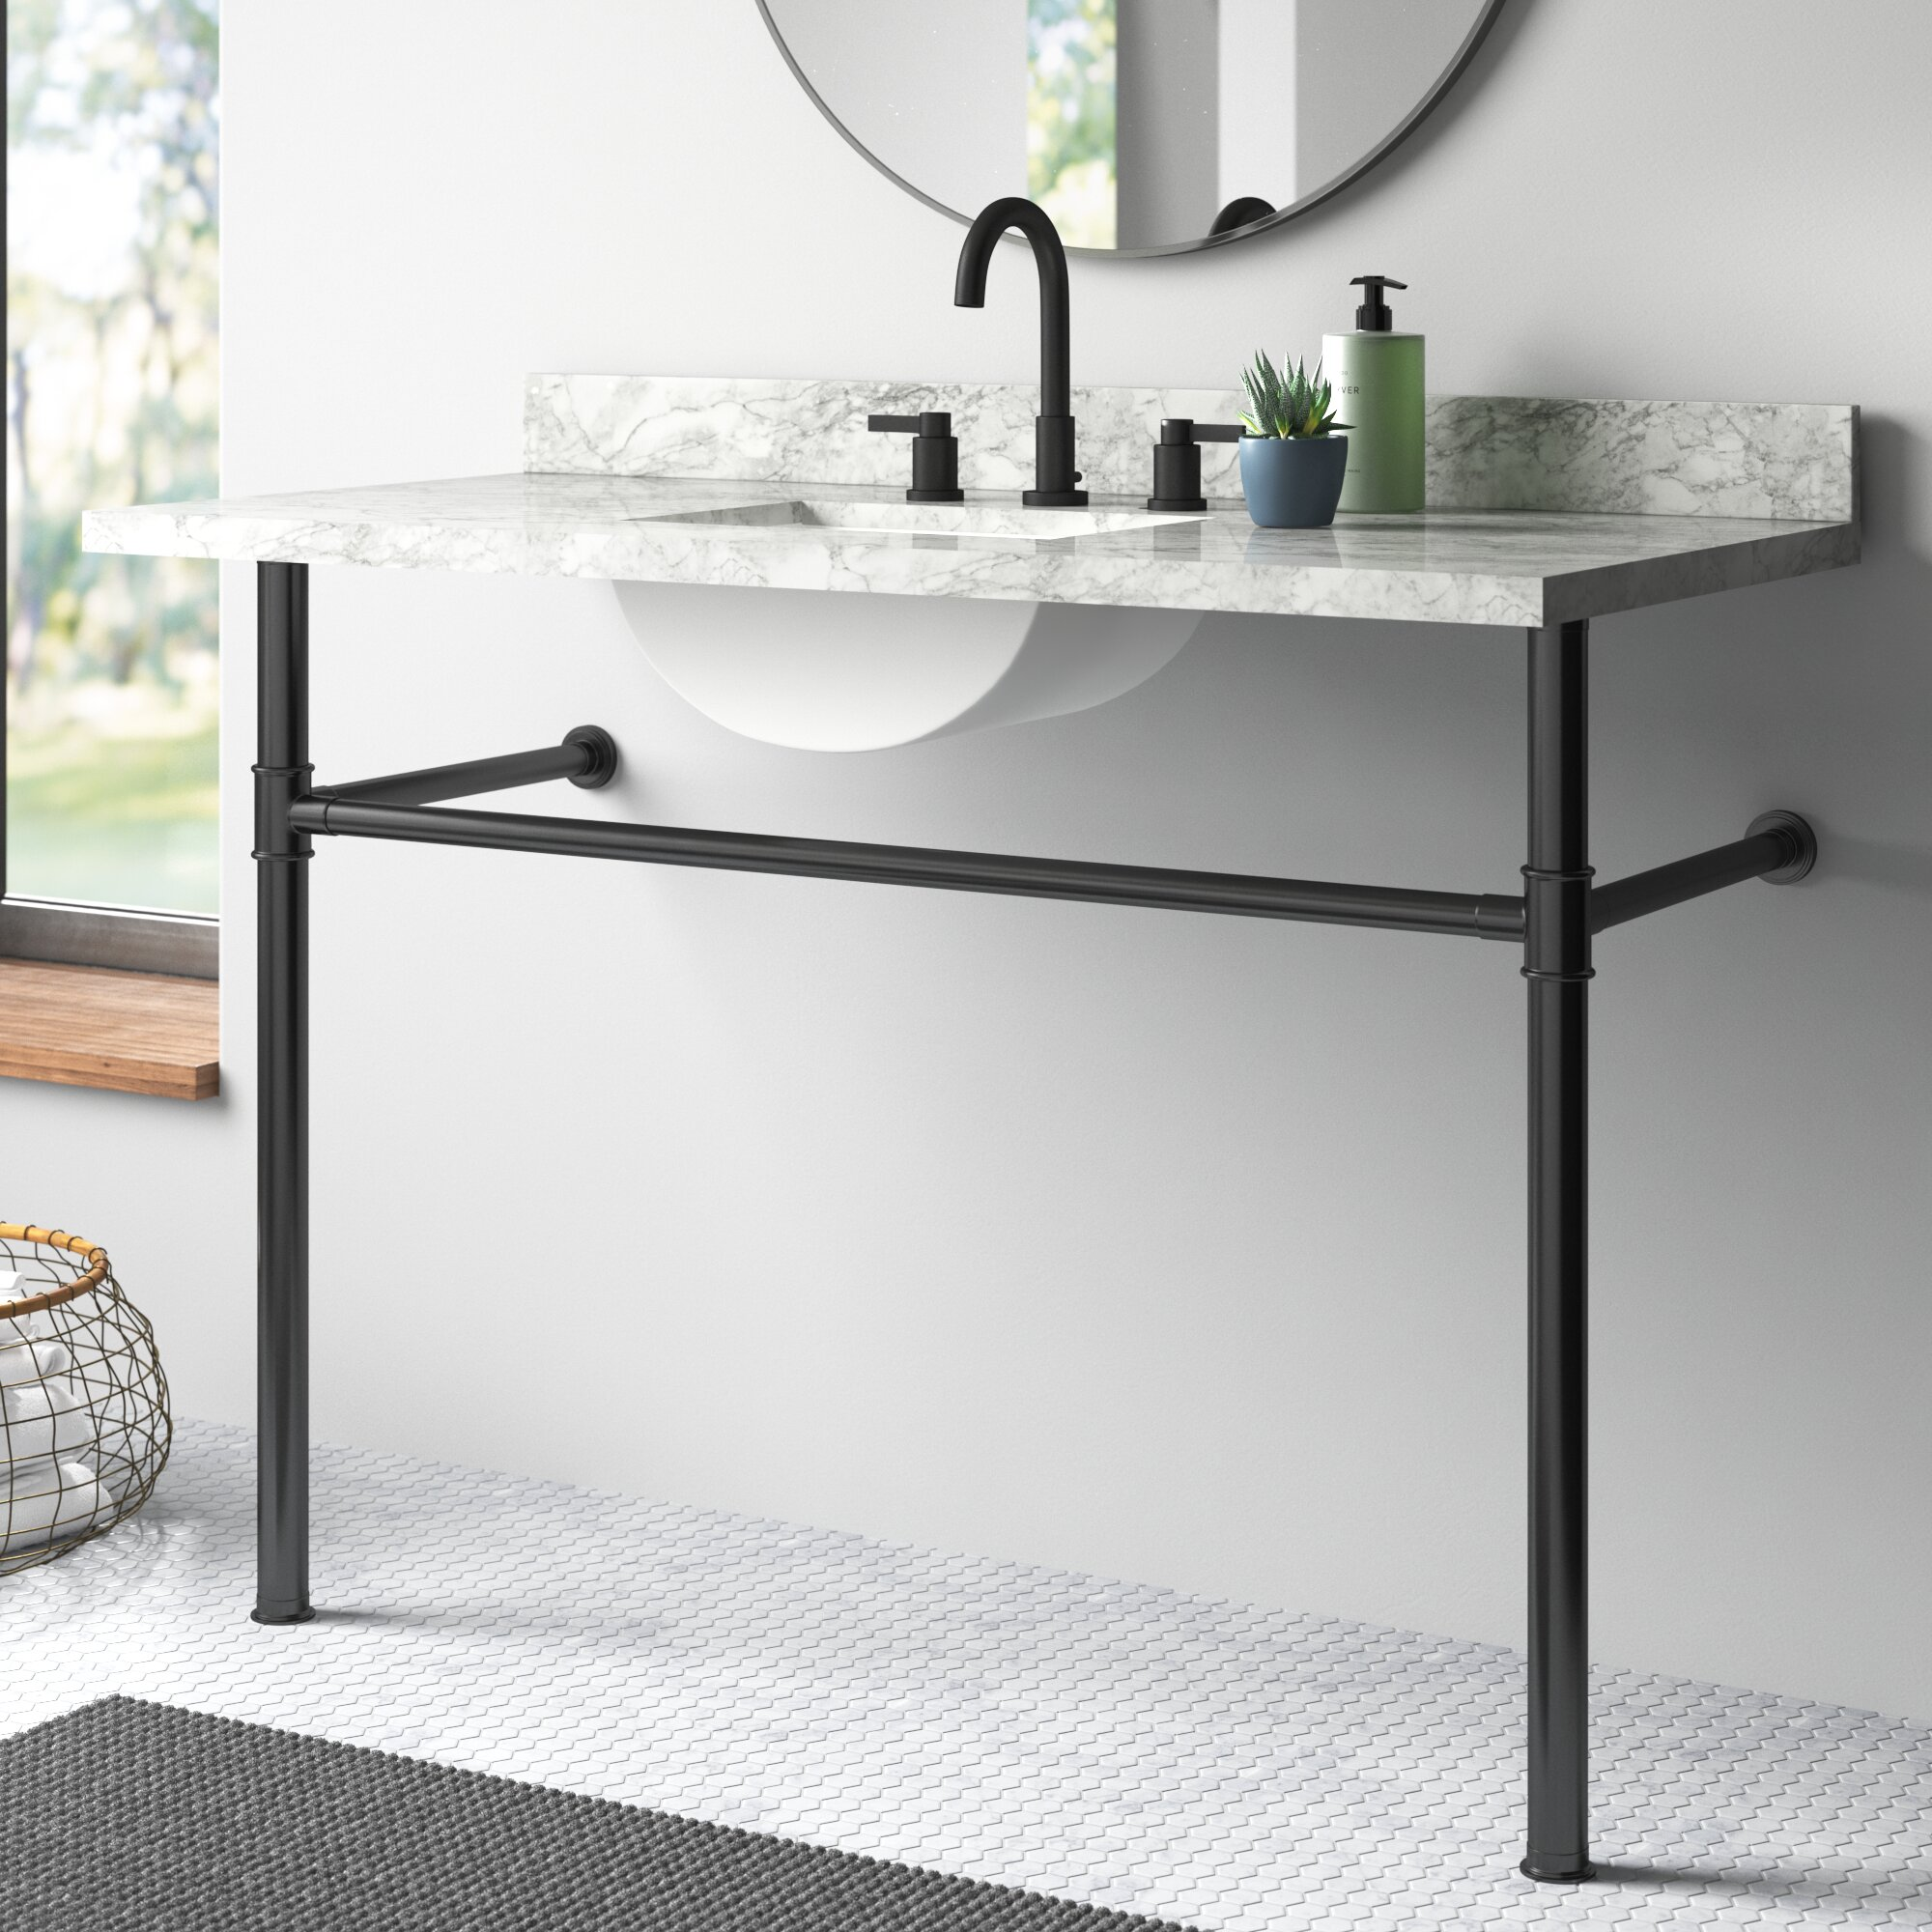 Kingston Brass Imperial Stainless Steel 41 Single Bathroom Vanity Base Only Reviews Wayfair